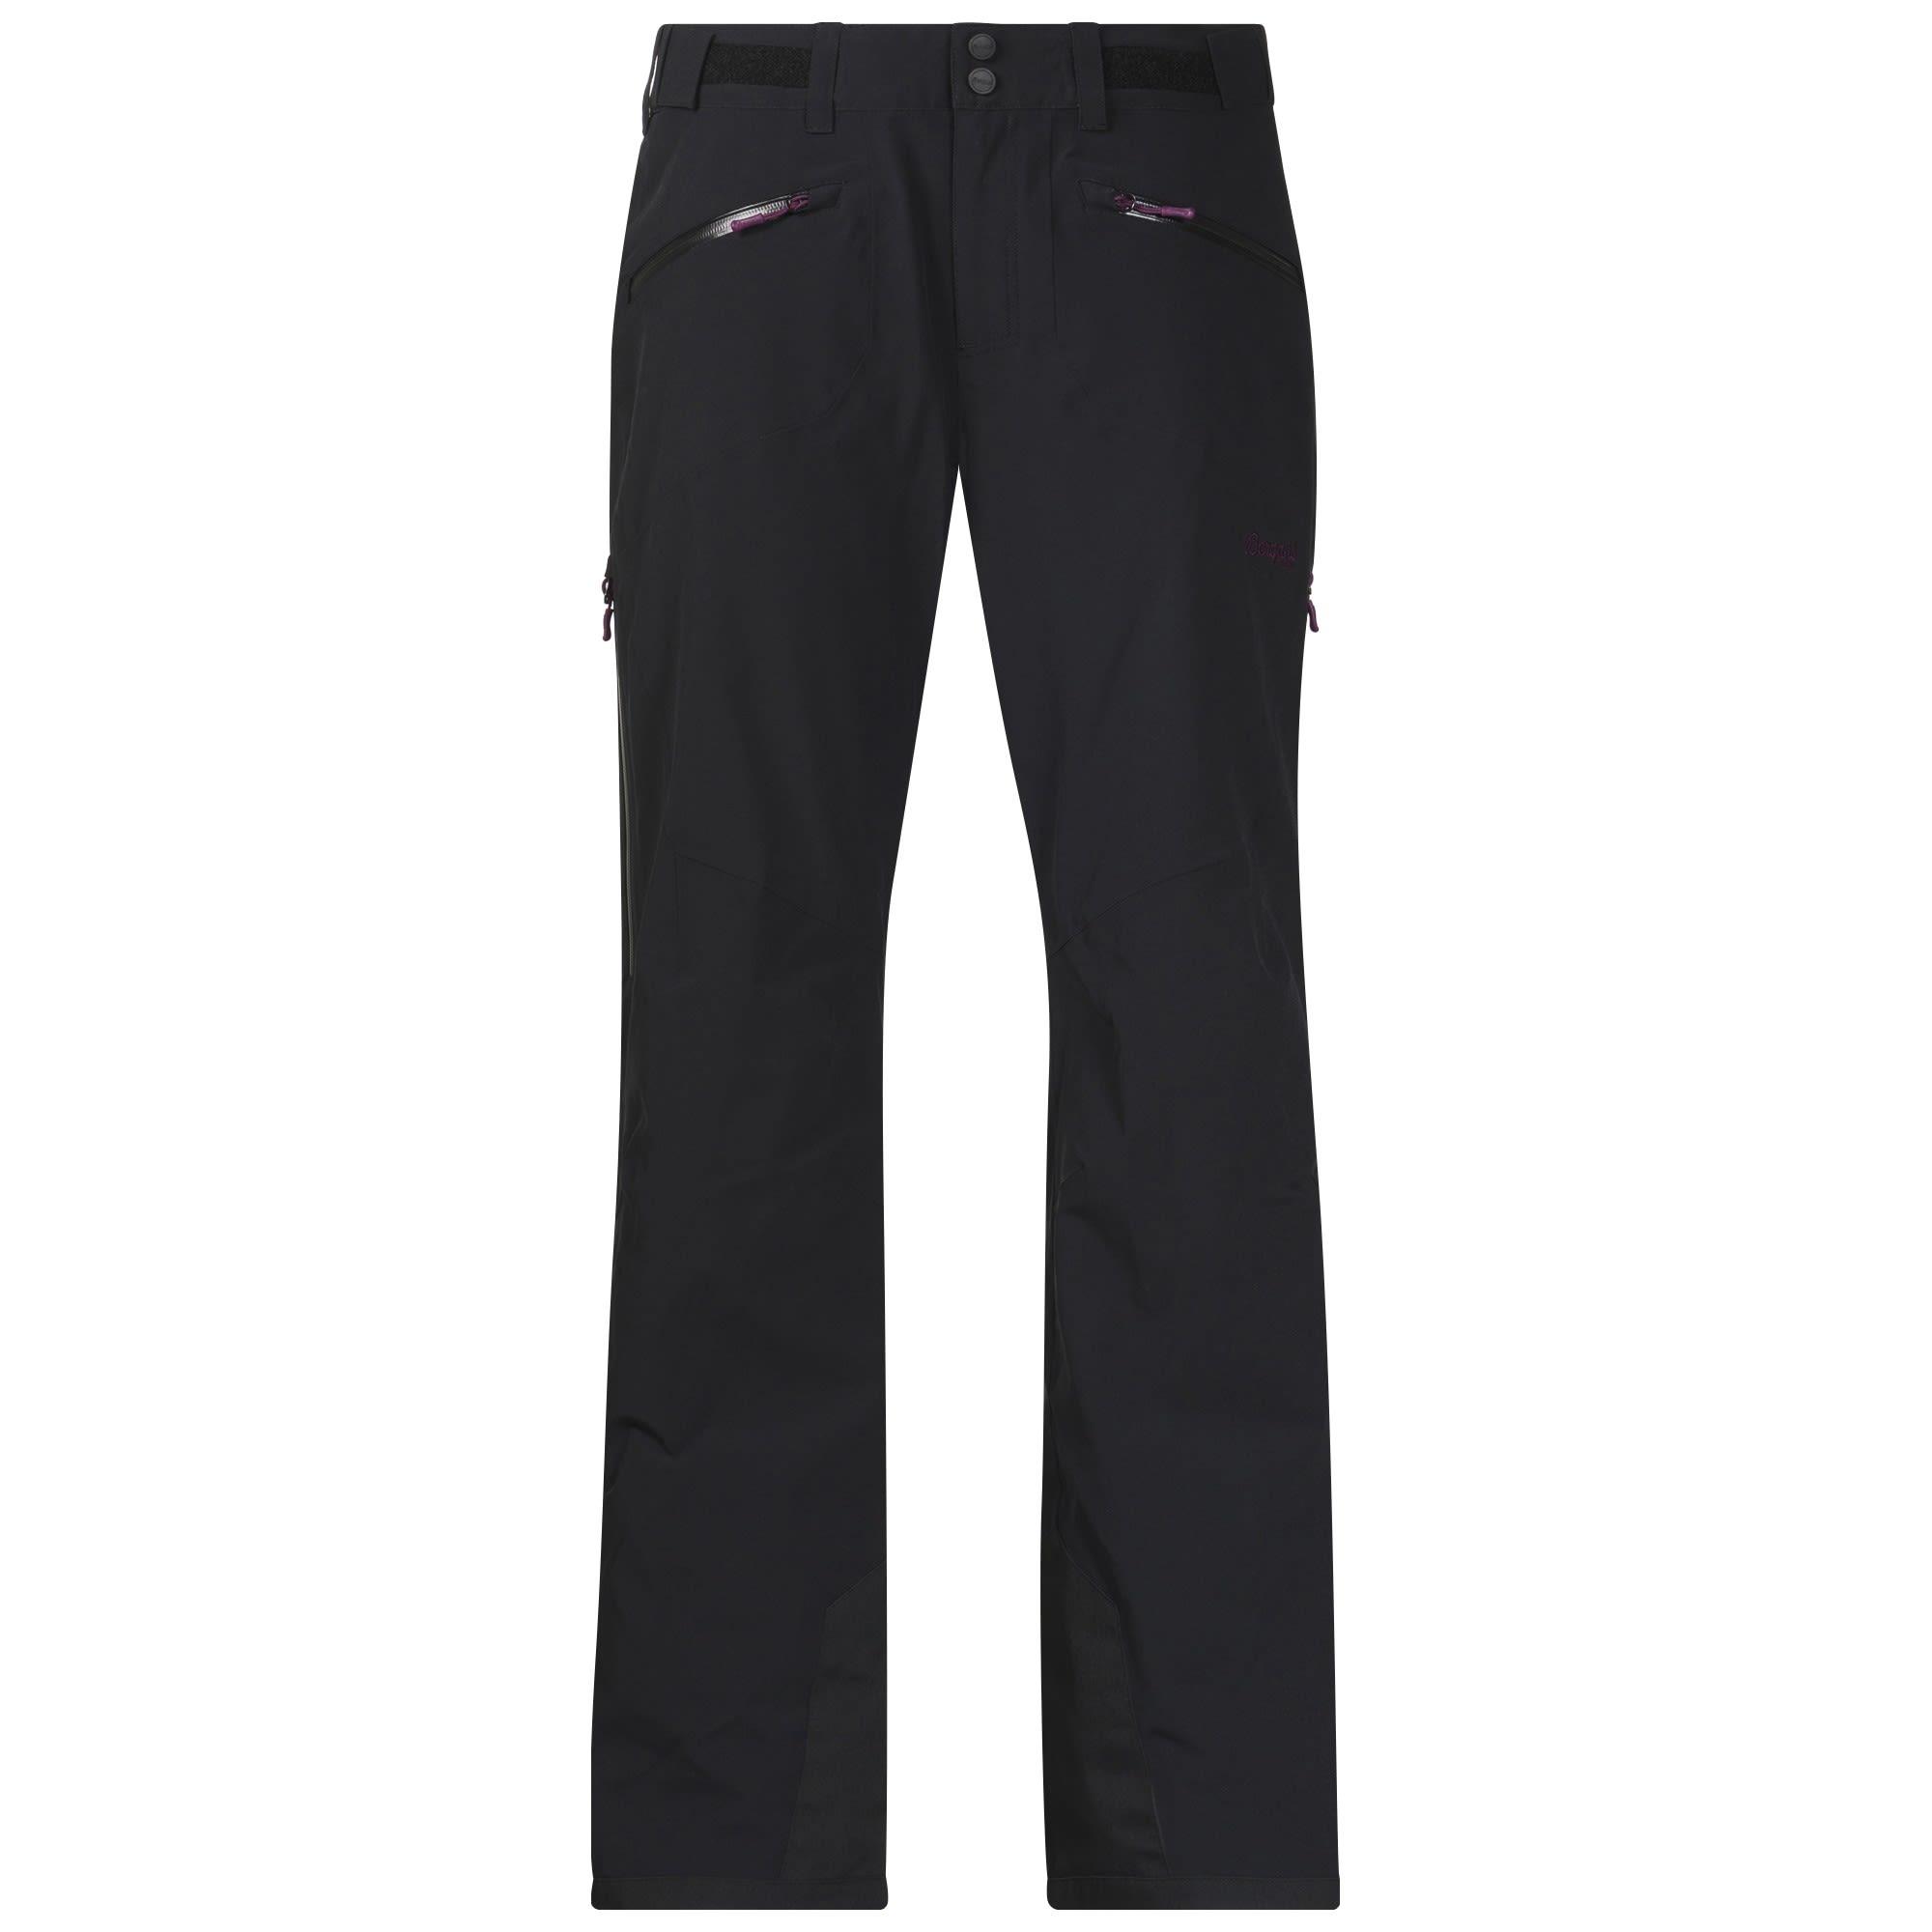 Bergans Oppdal Insulated Pants Schwarz, Female Hose, XS